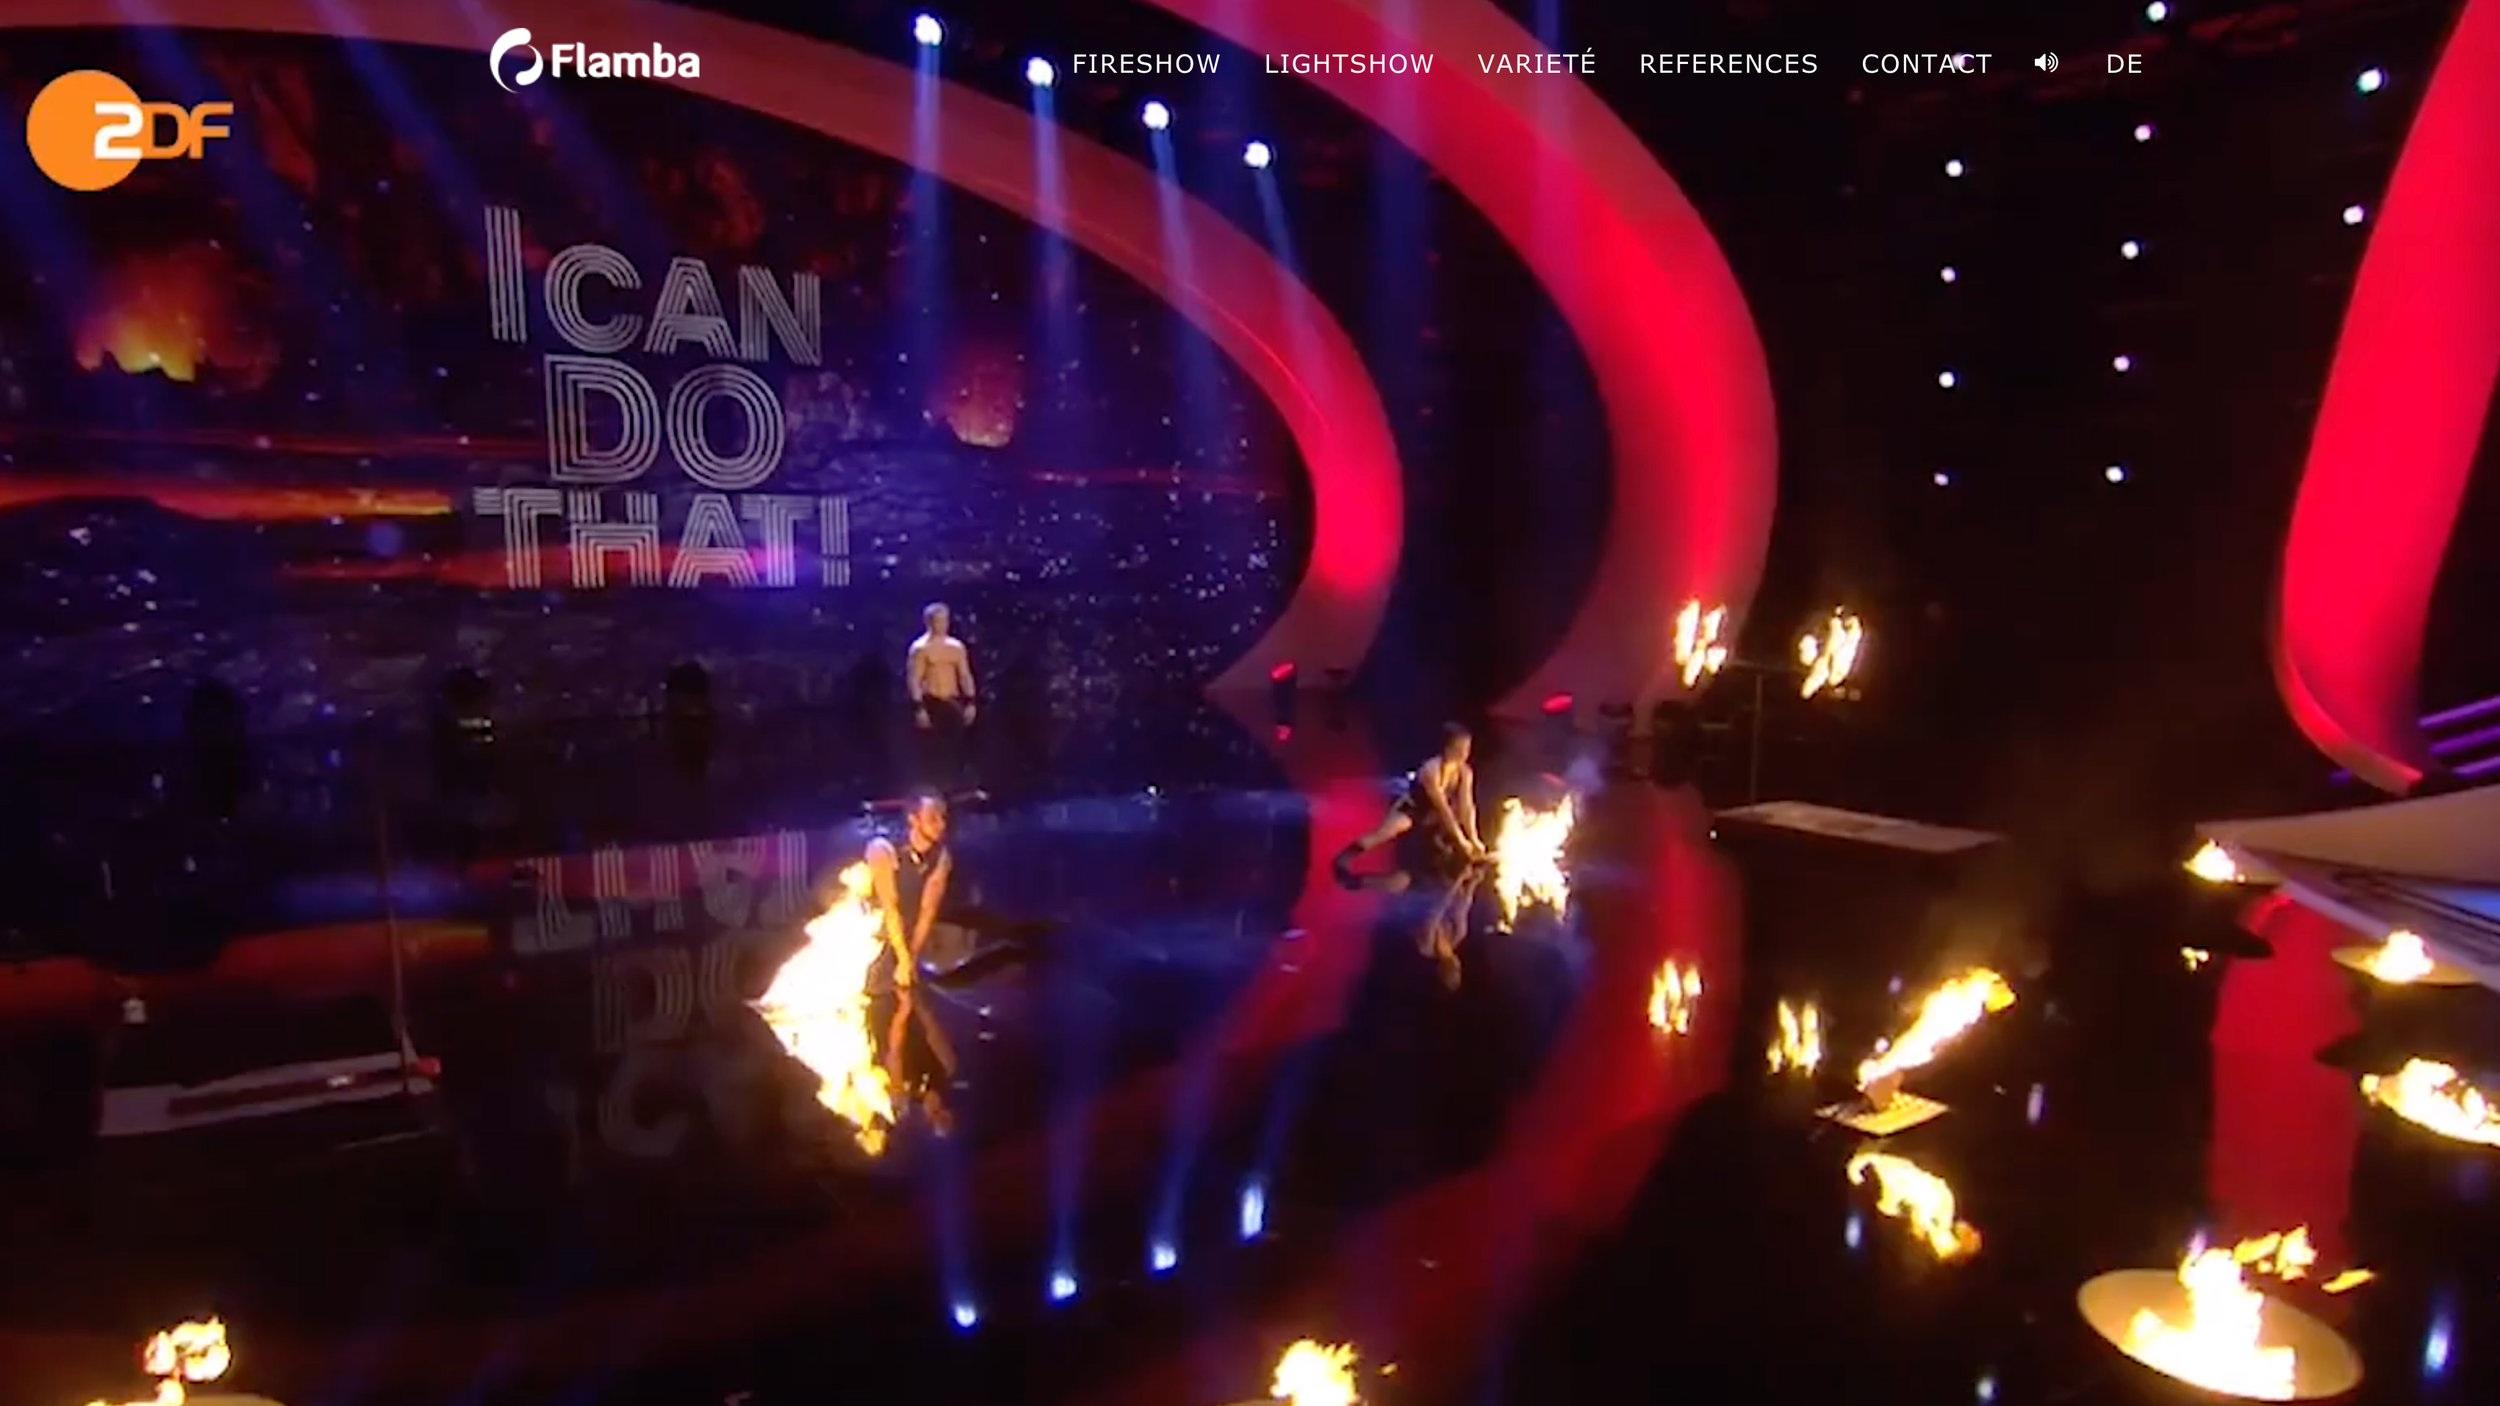 flamba-webseite.jpg